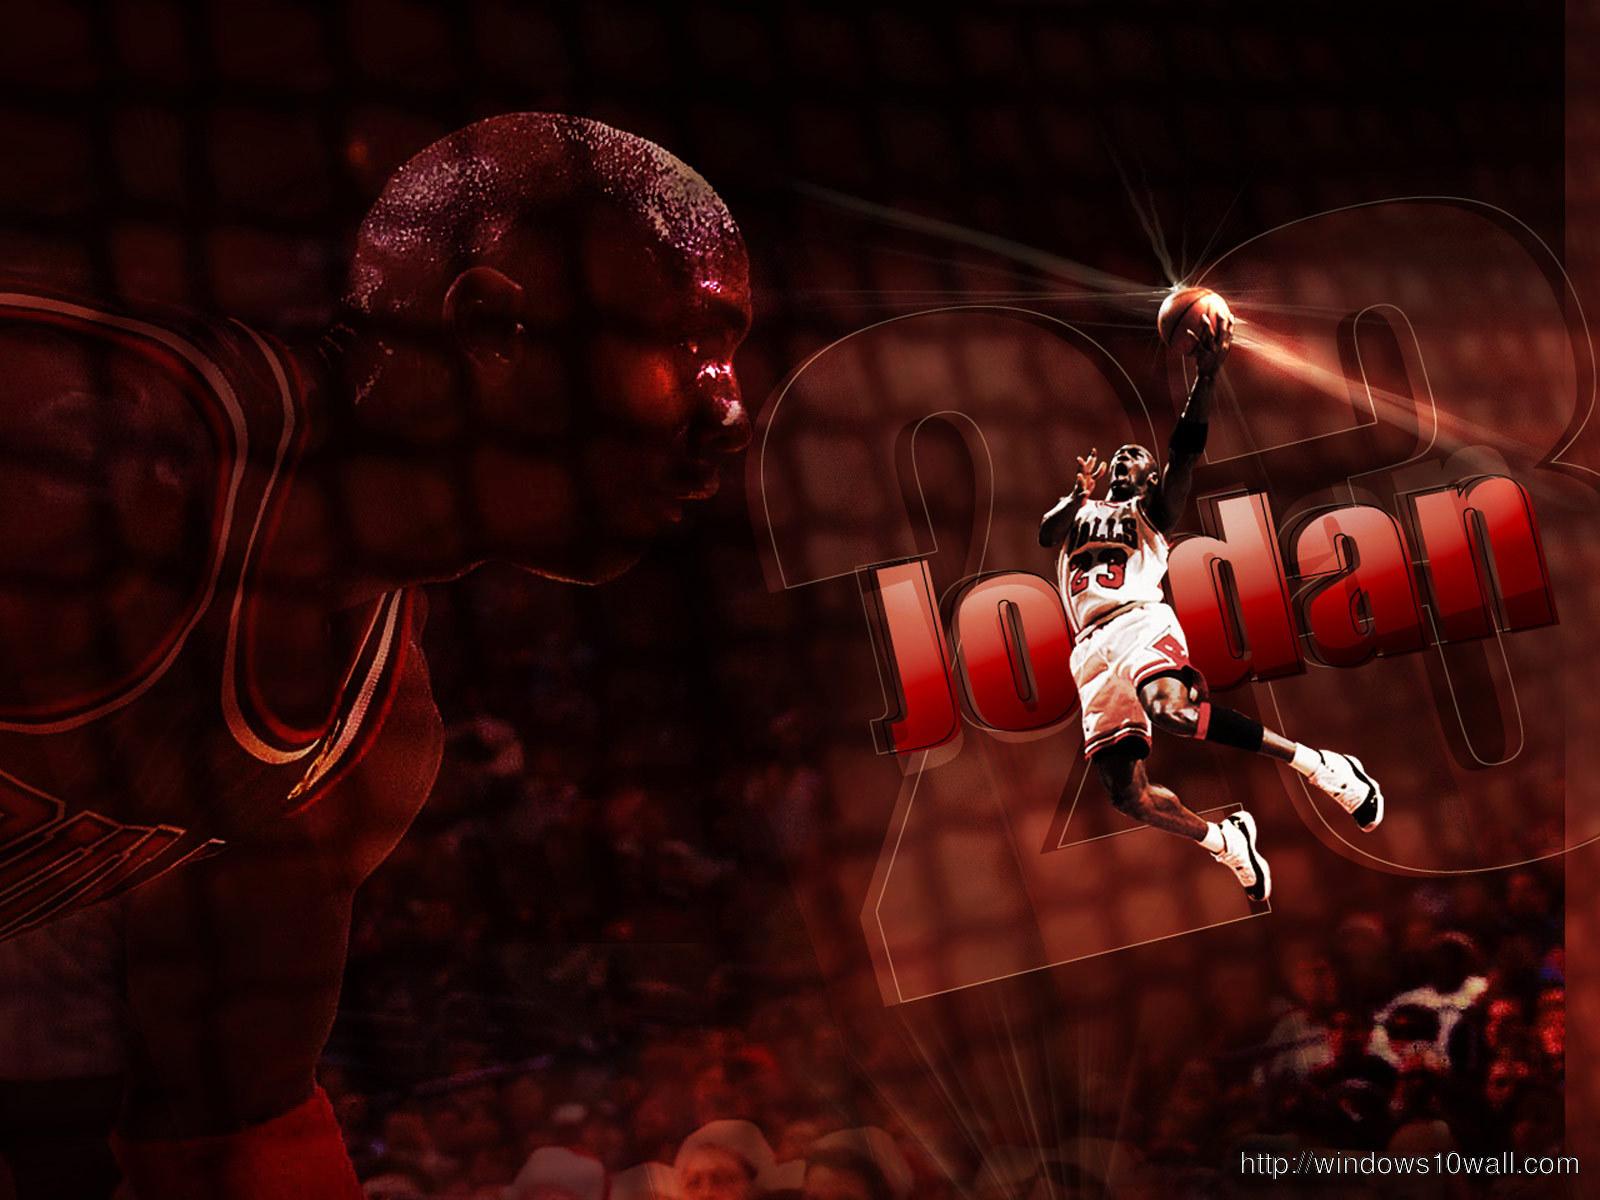 Michael Jordan Dunk Hd Background Wallpaper Windows 10